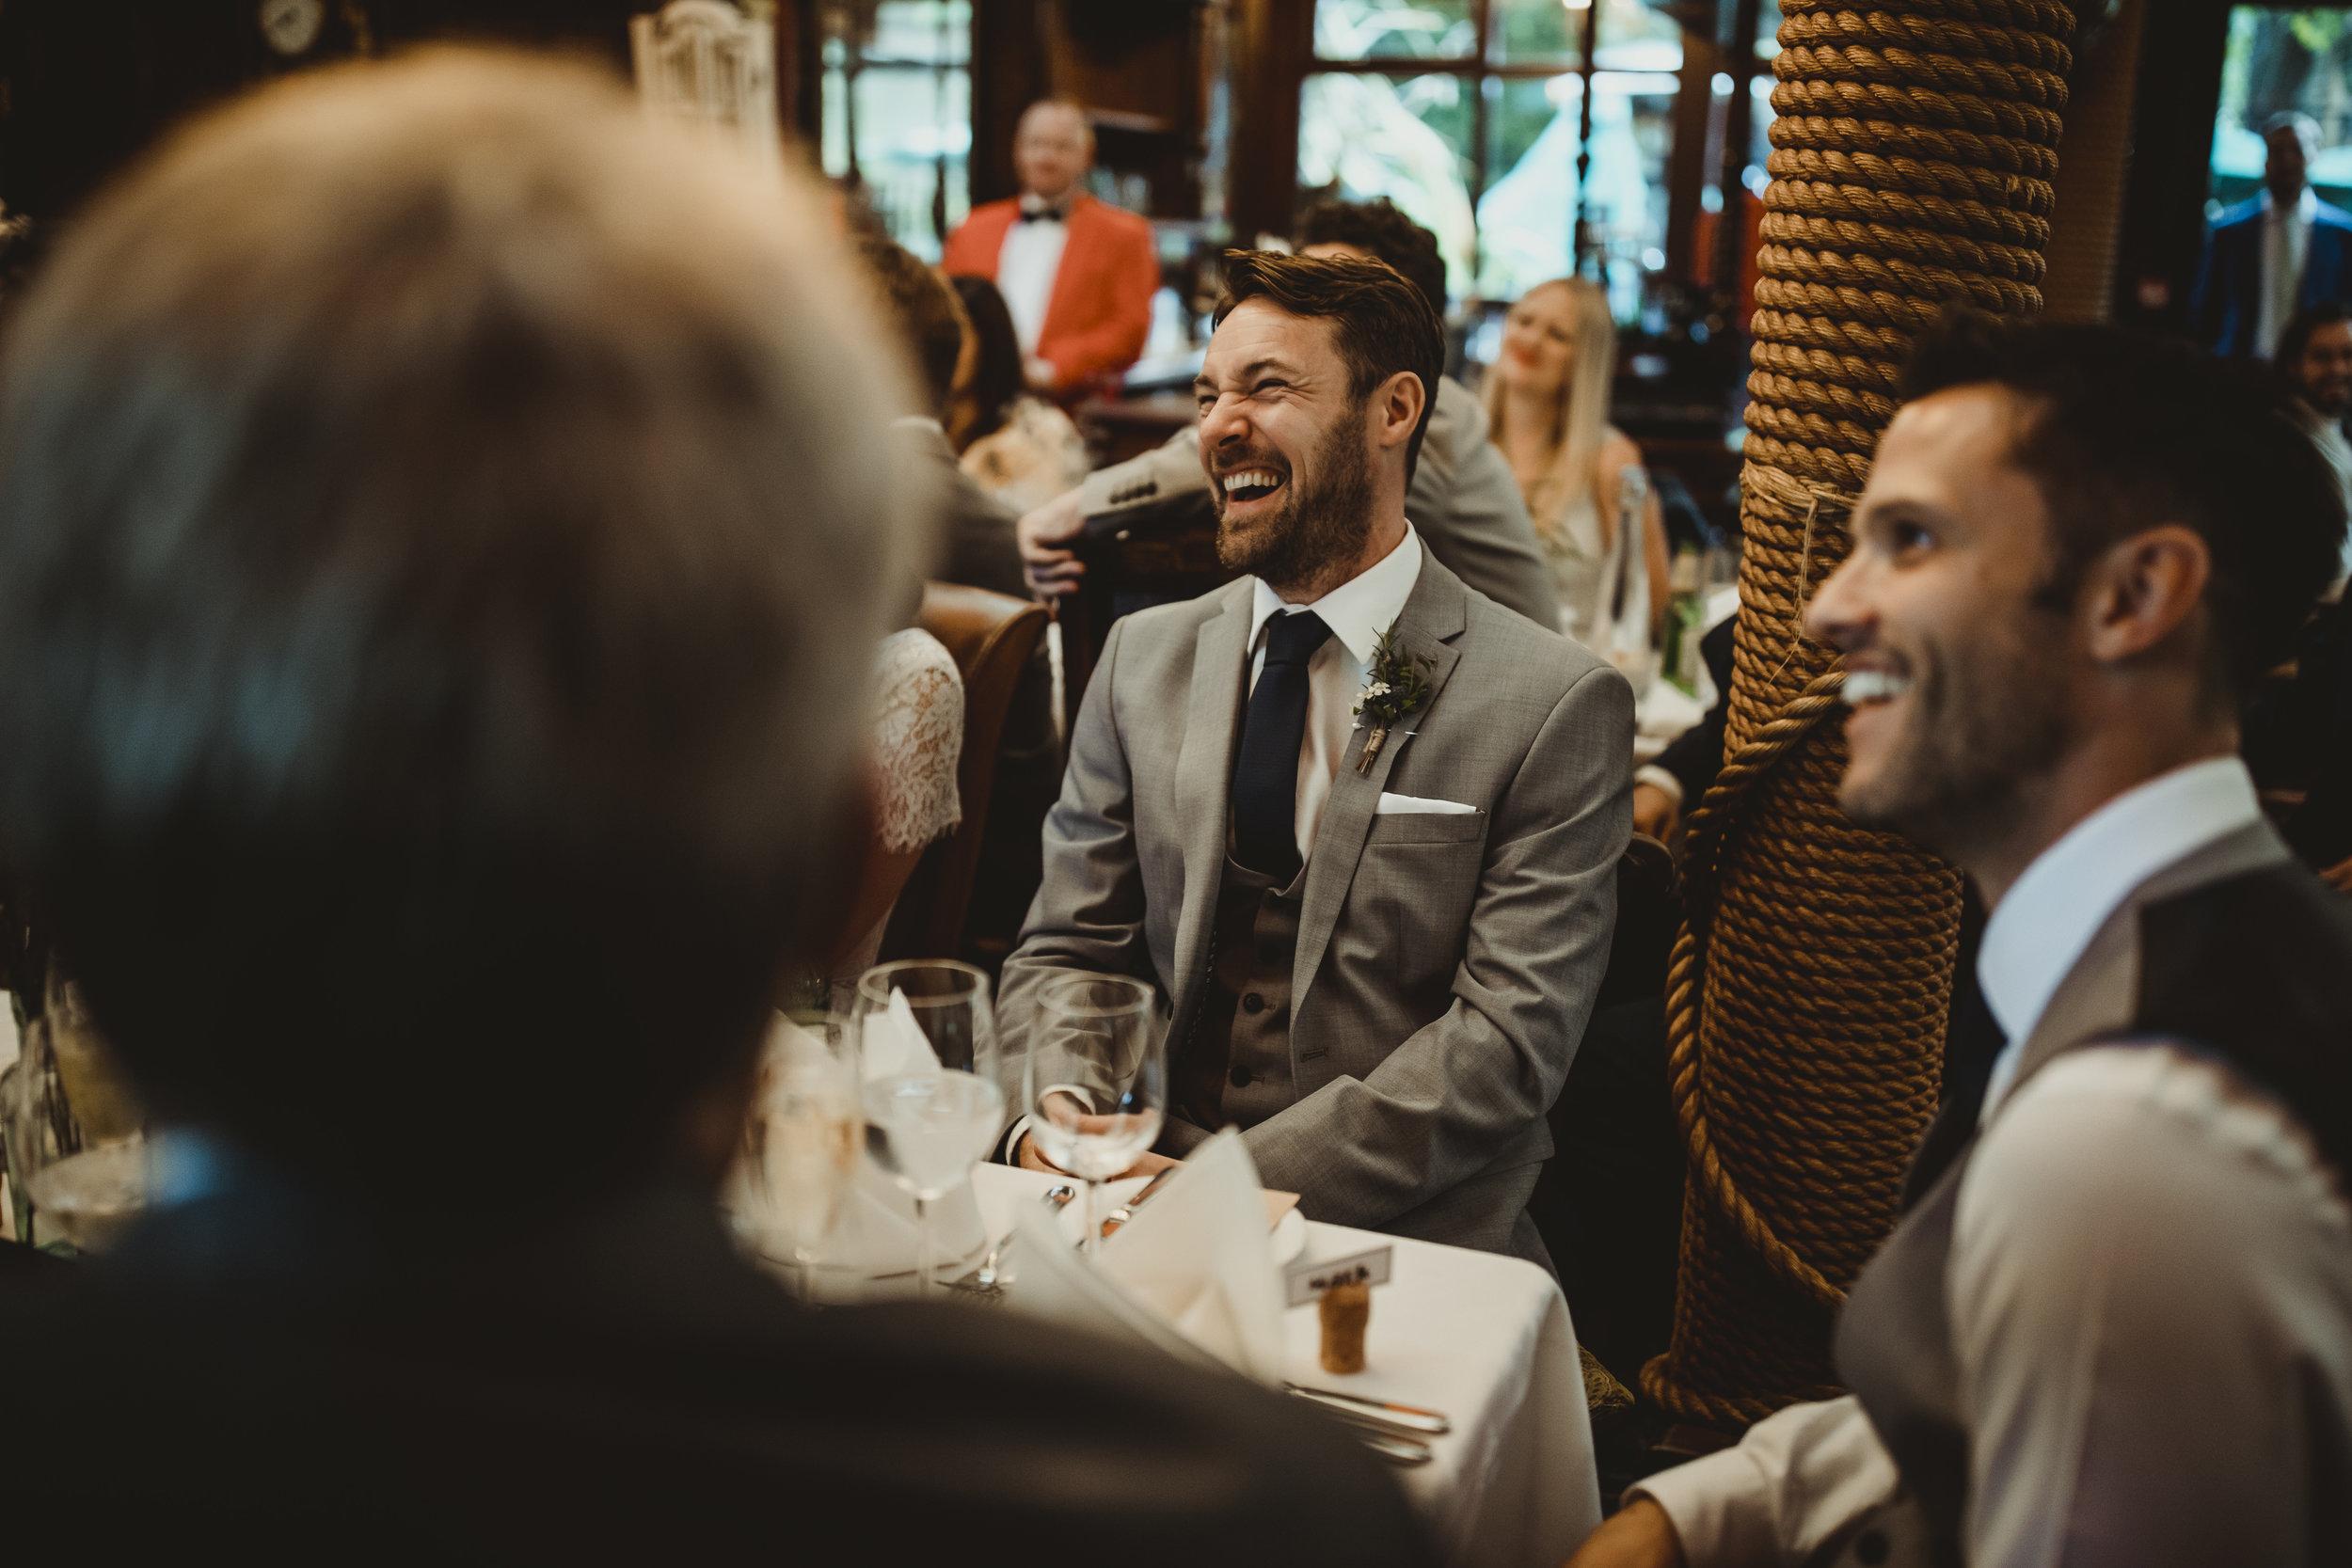 N&J_YORKSHIRE_WEDDING_PHOTOGRAPHER_MALTON_LEEDS_SHEFFIELD-698.JPG